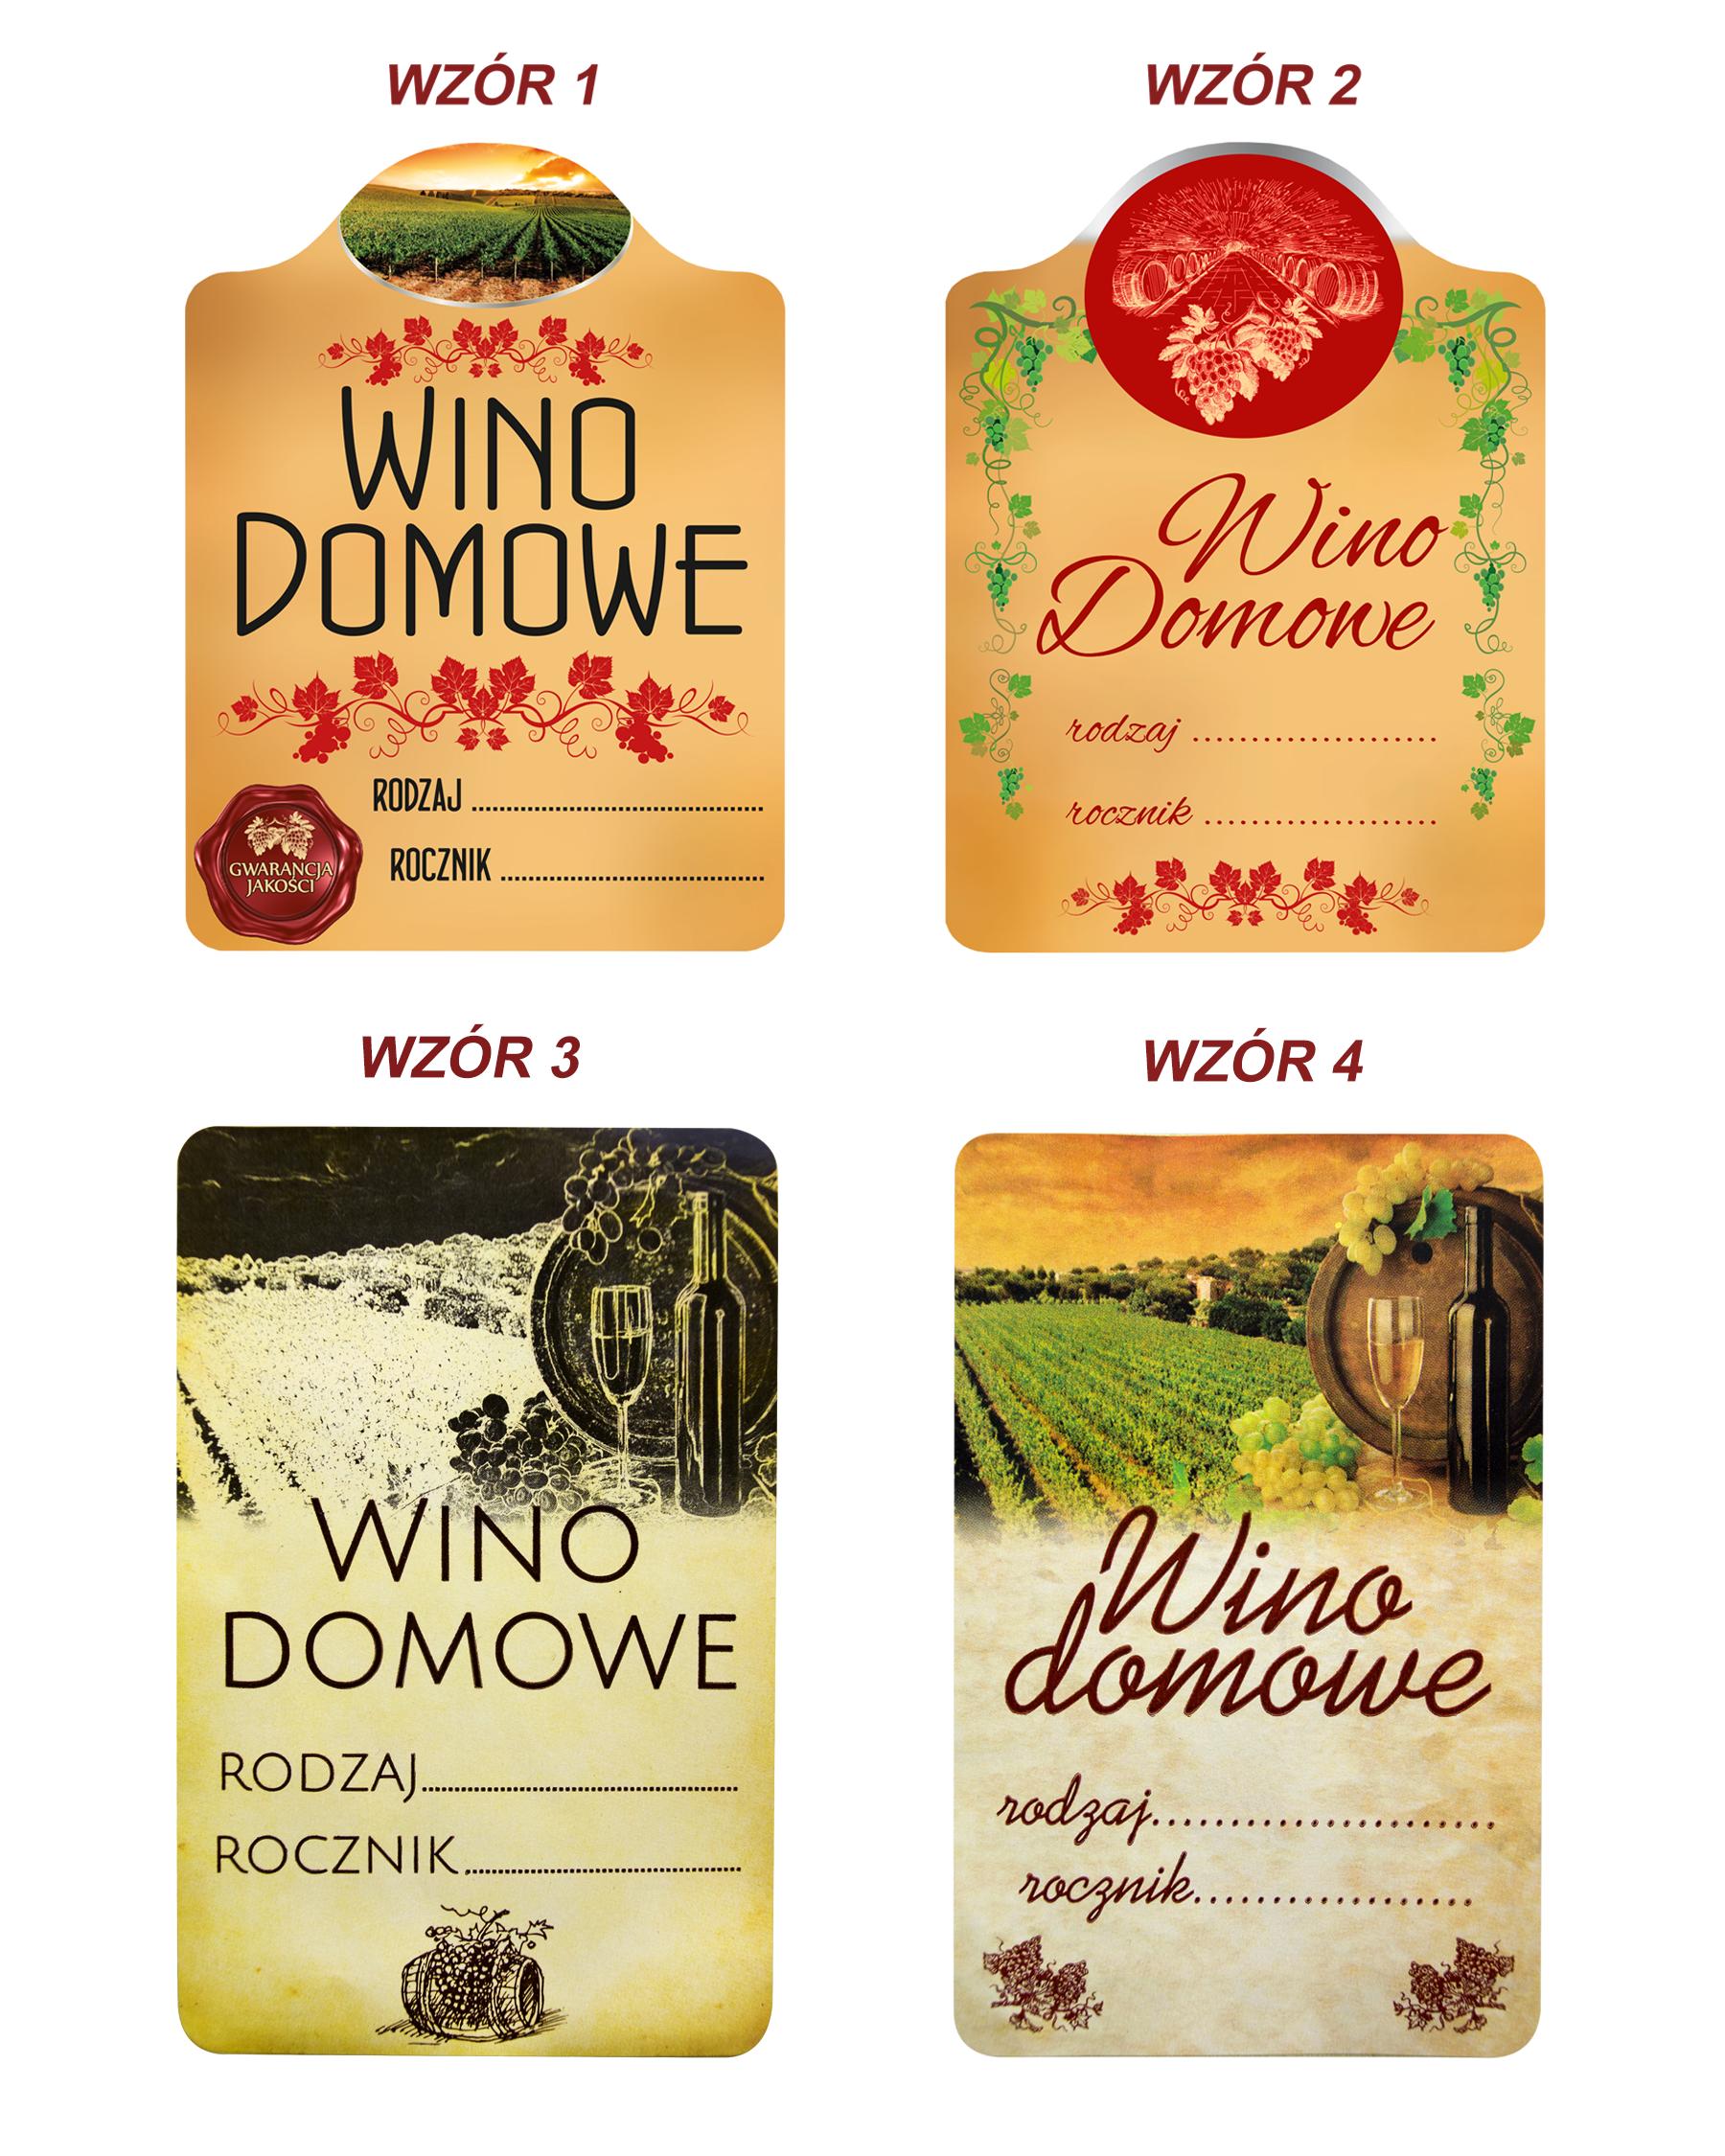 20 Szt Etykiety Na Wino Domowe Samoprzylepne Superbutelki Pl